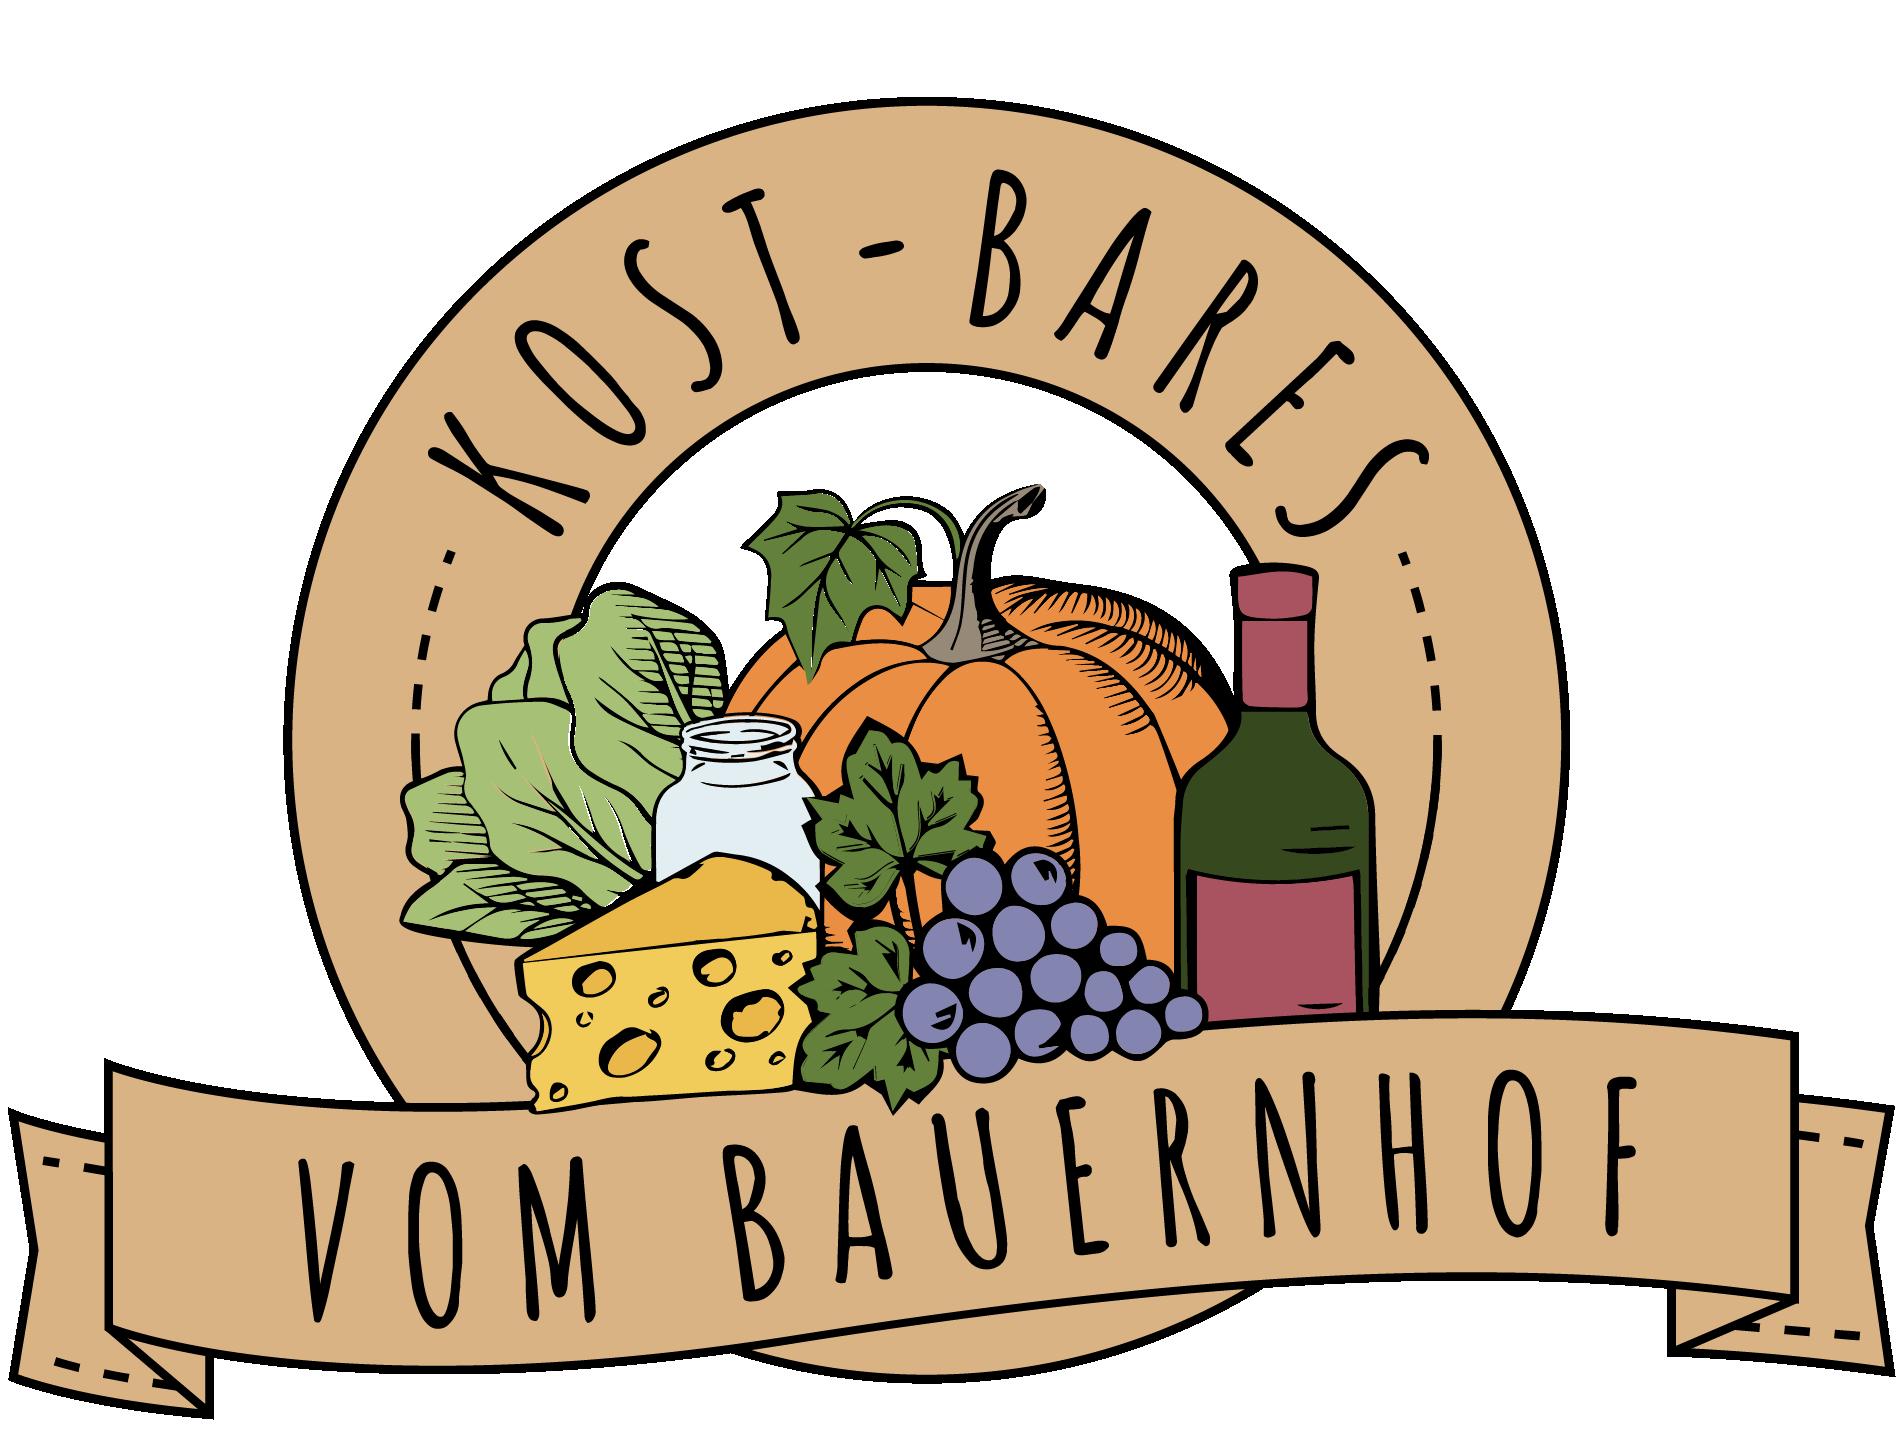 kost-bares-logo